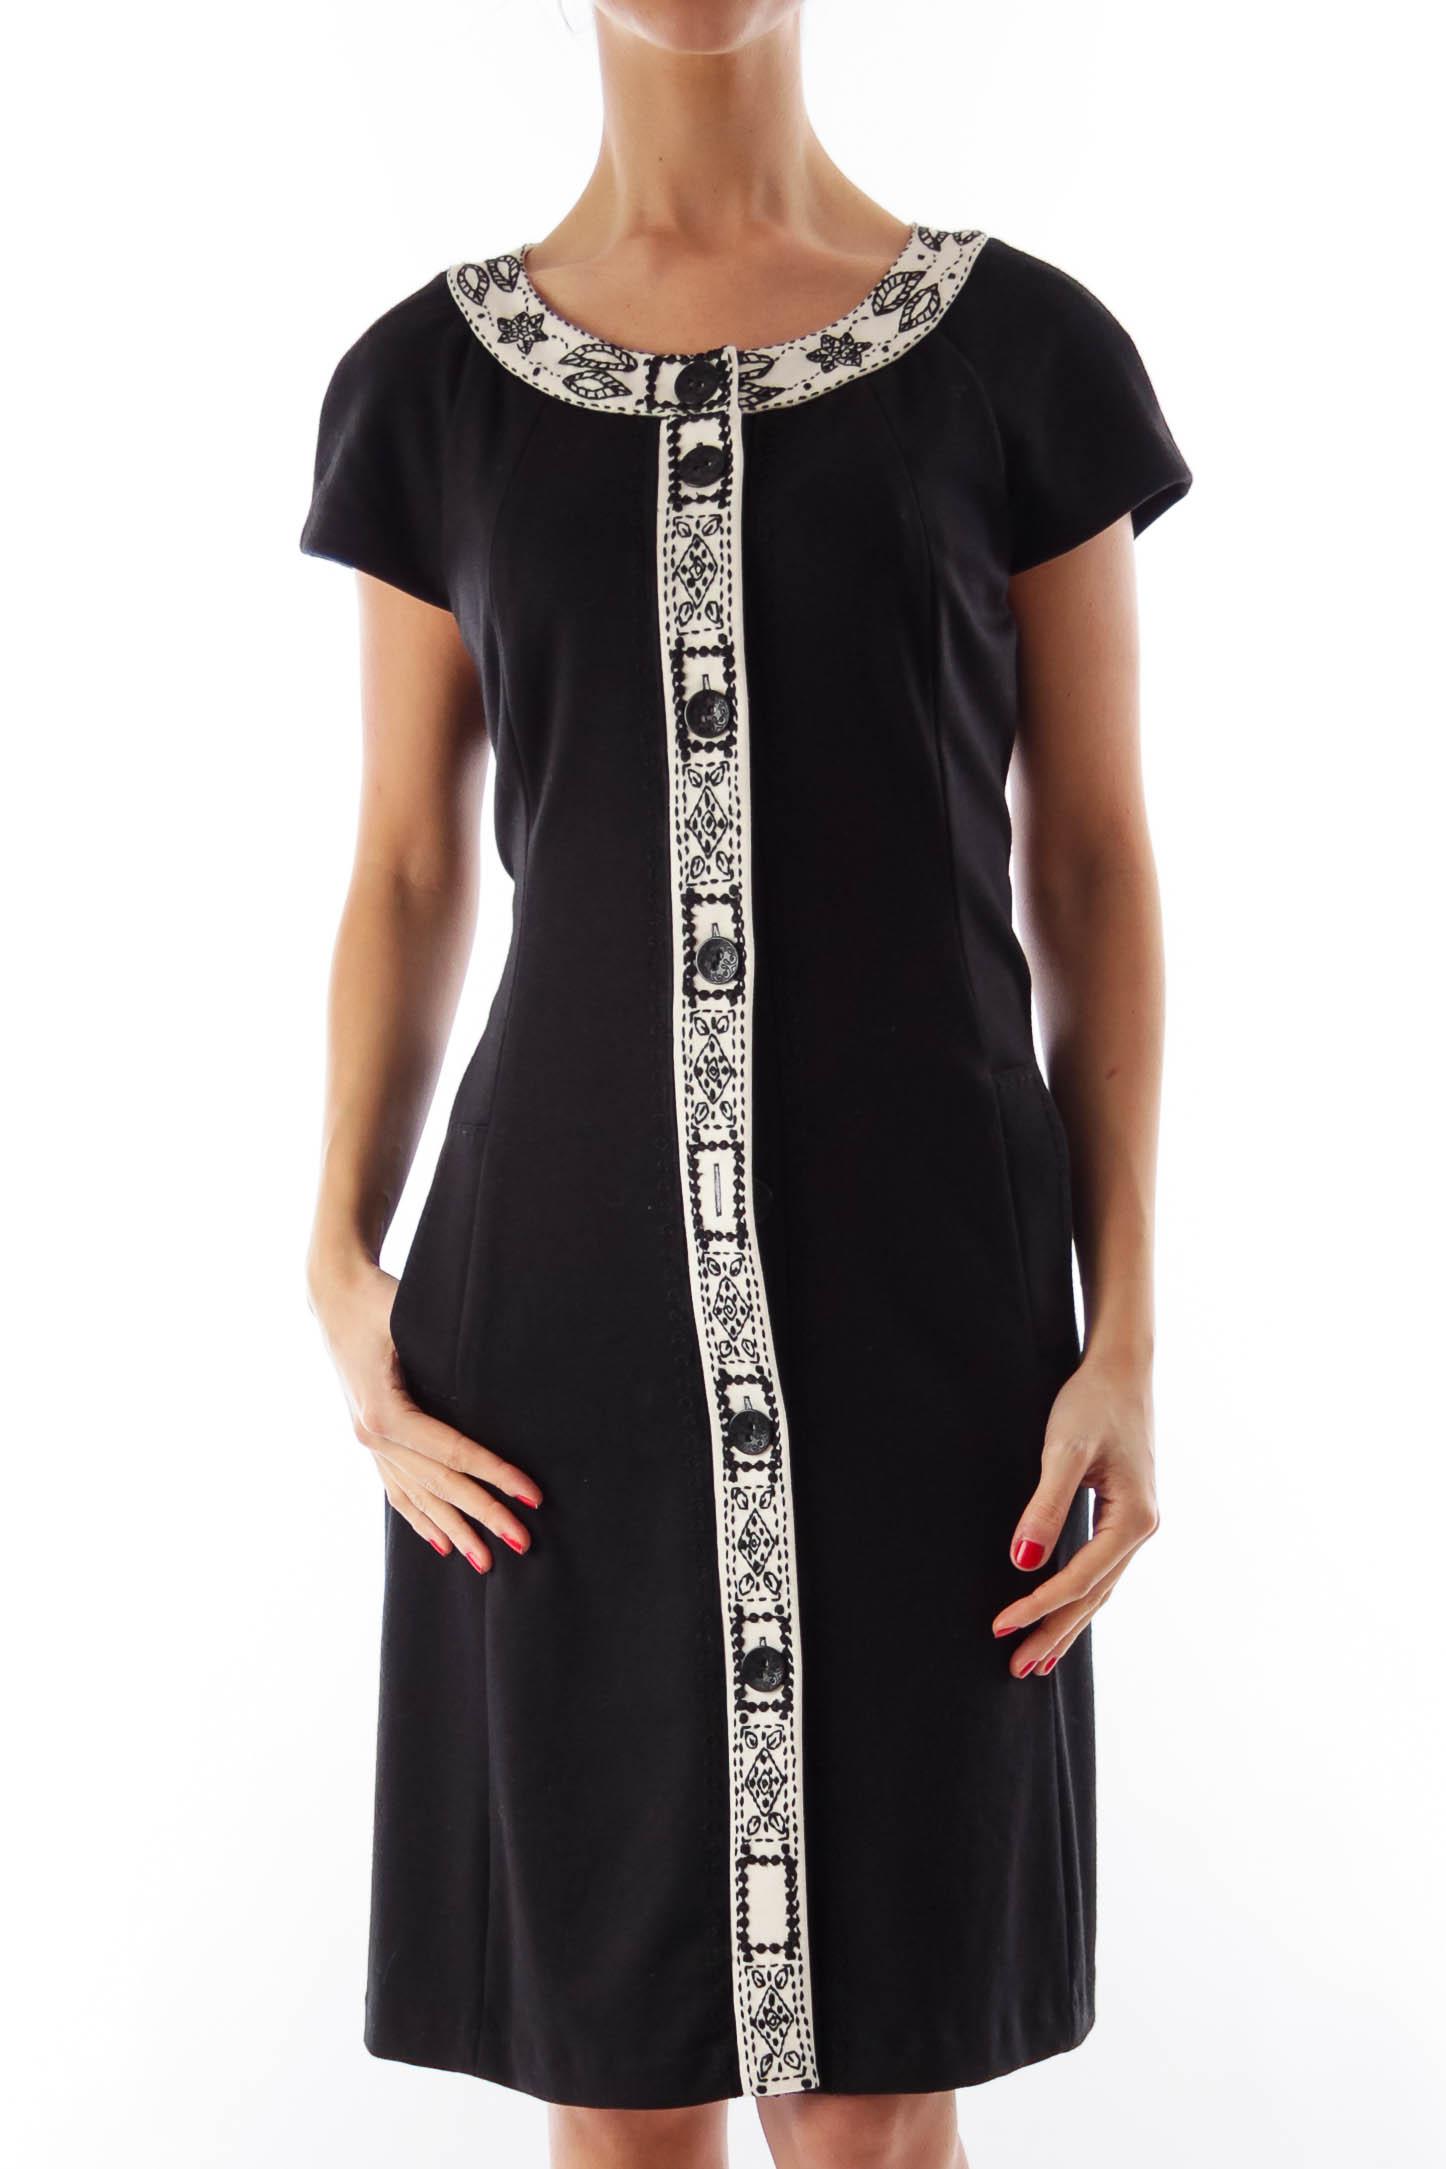 Black & White Detail Trim Dress